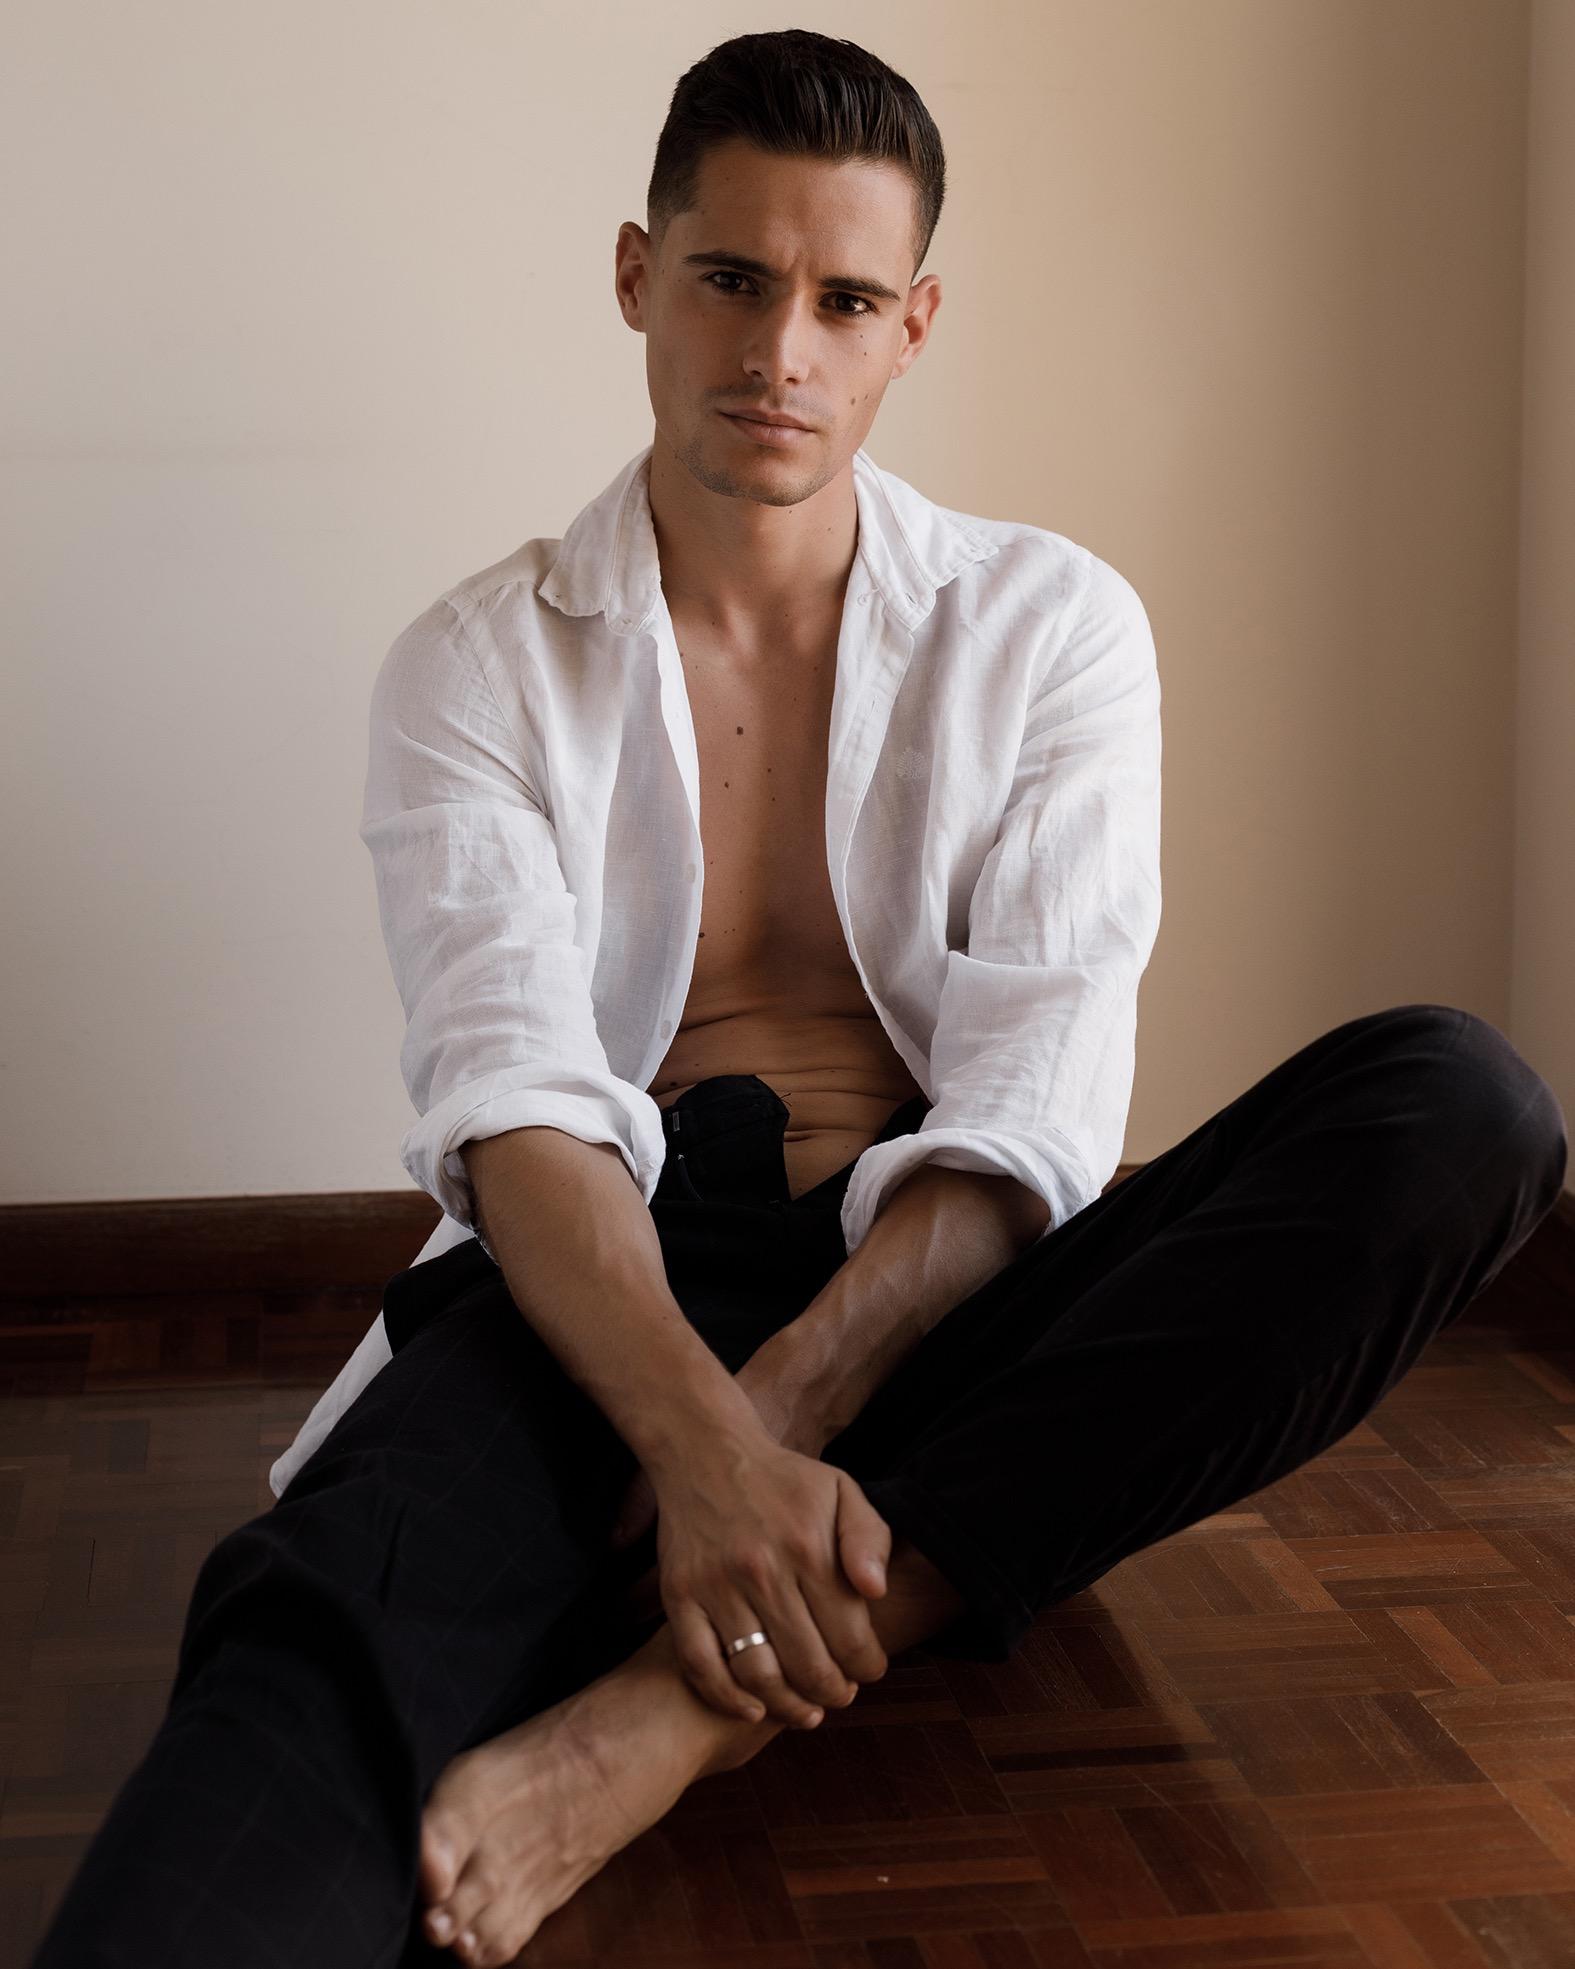 Diogo Filipe